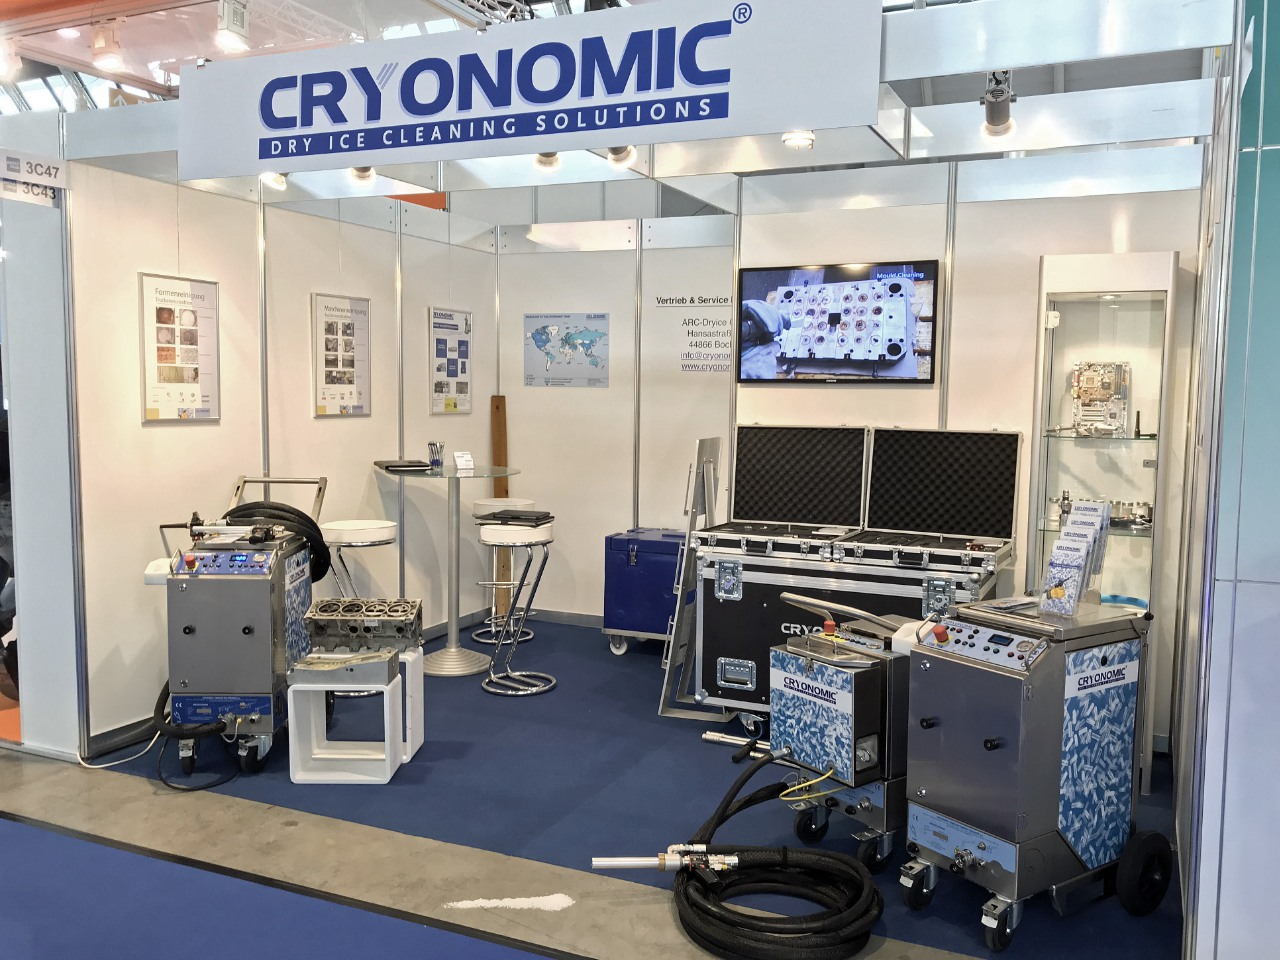 Cryonomic Messestand  Trockeneis ARC-Dryice